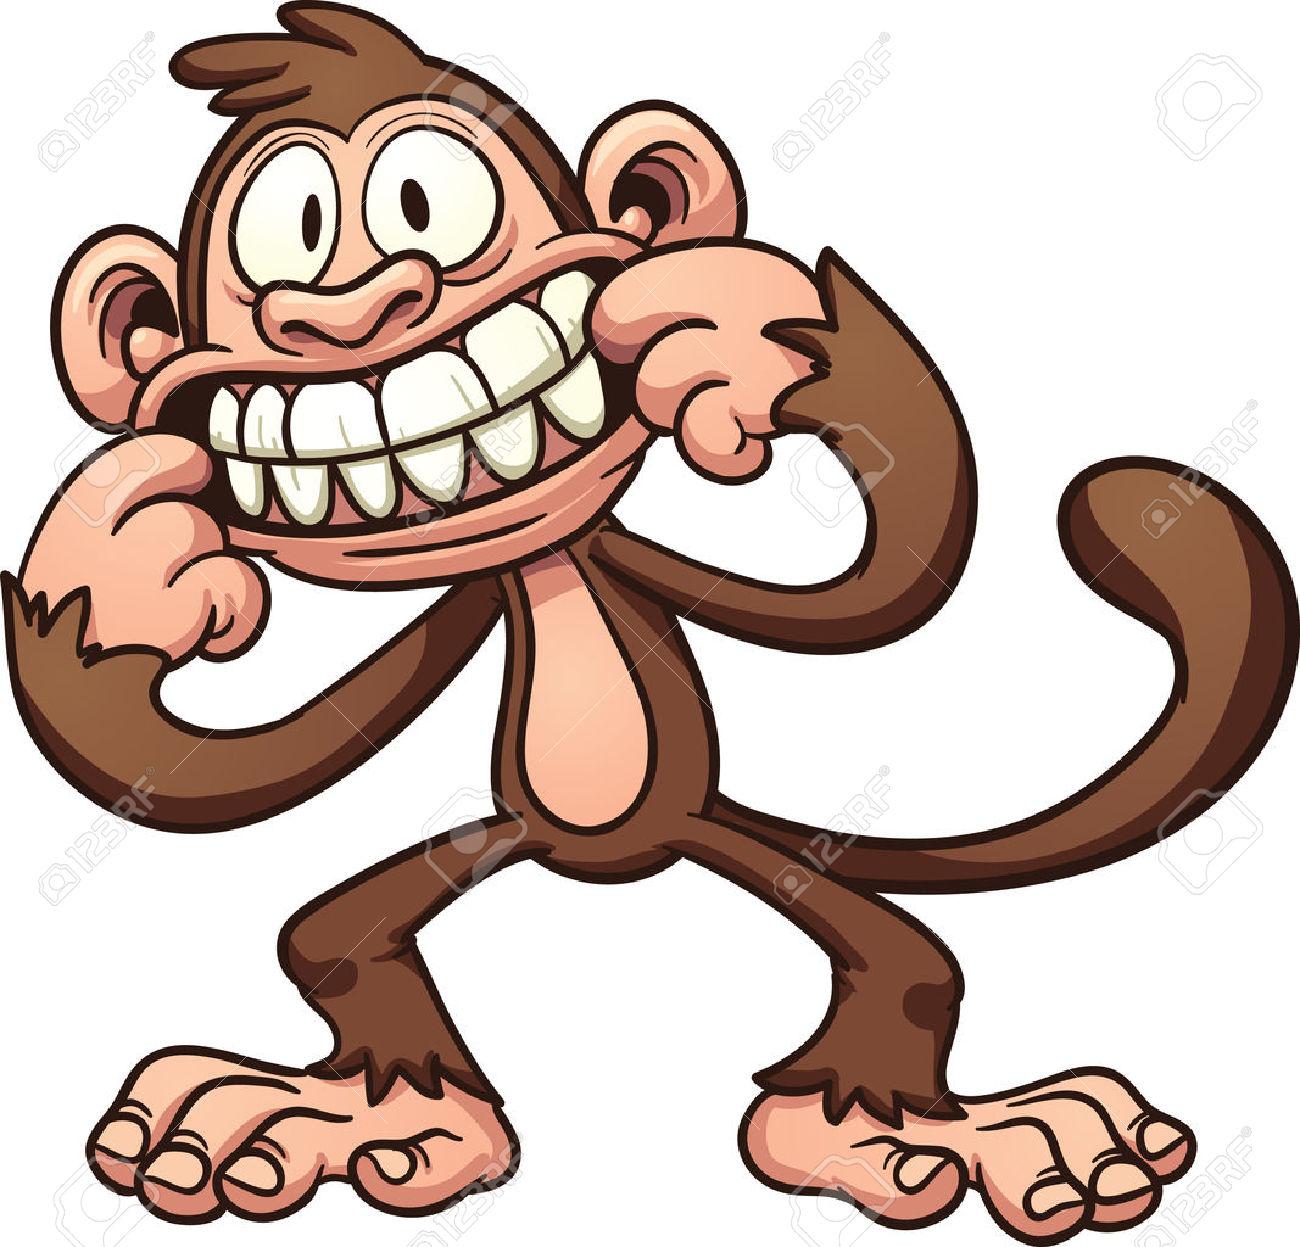 Mocking Cartoon Monkey Vector Clip Art Illustration With Simple.